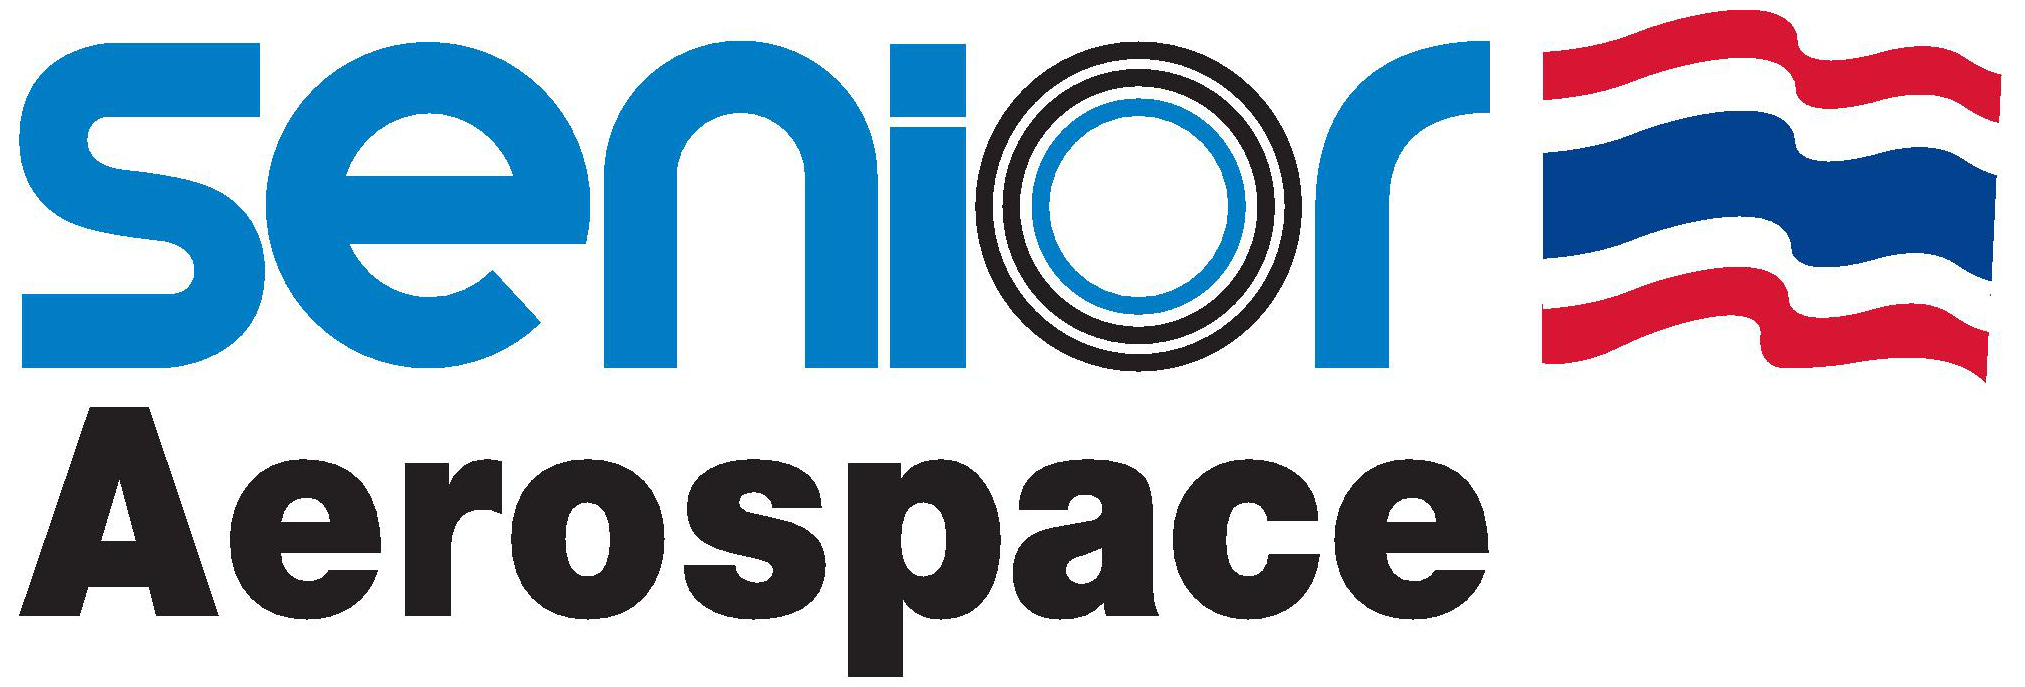 SAT logo-page-001RRR